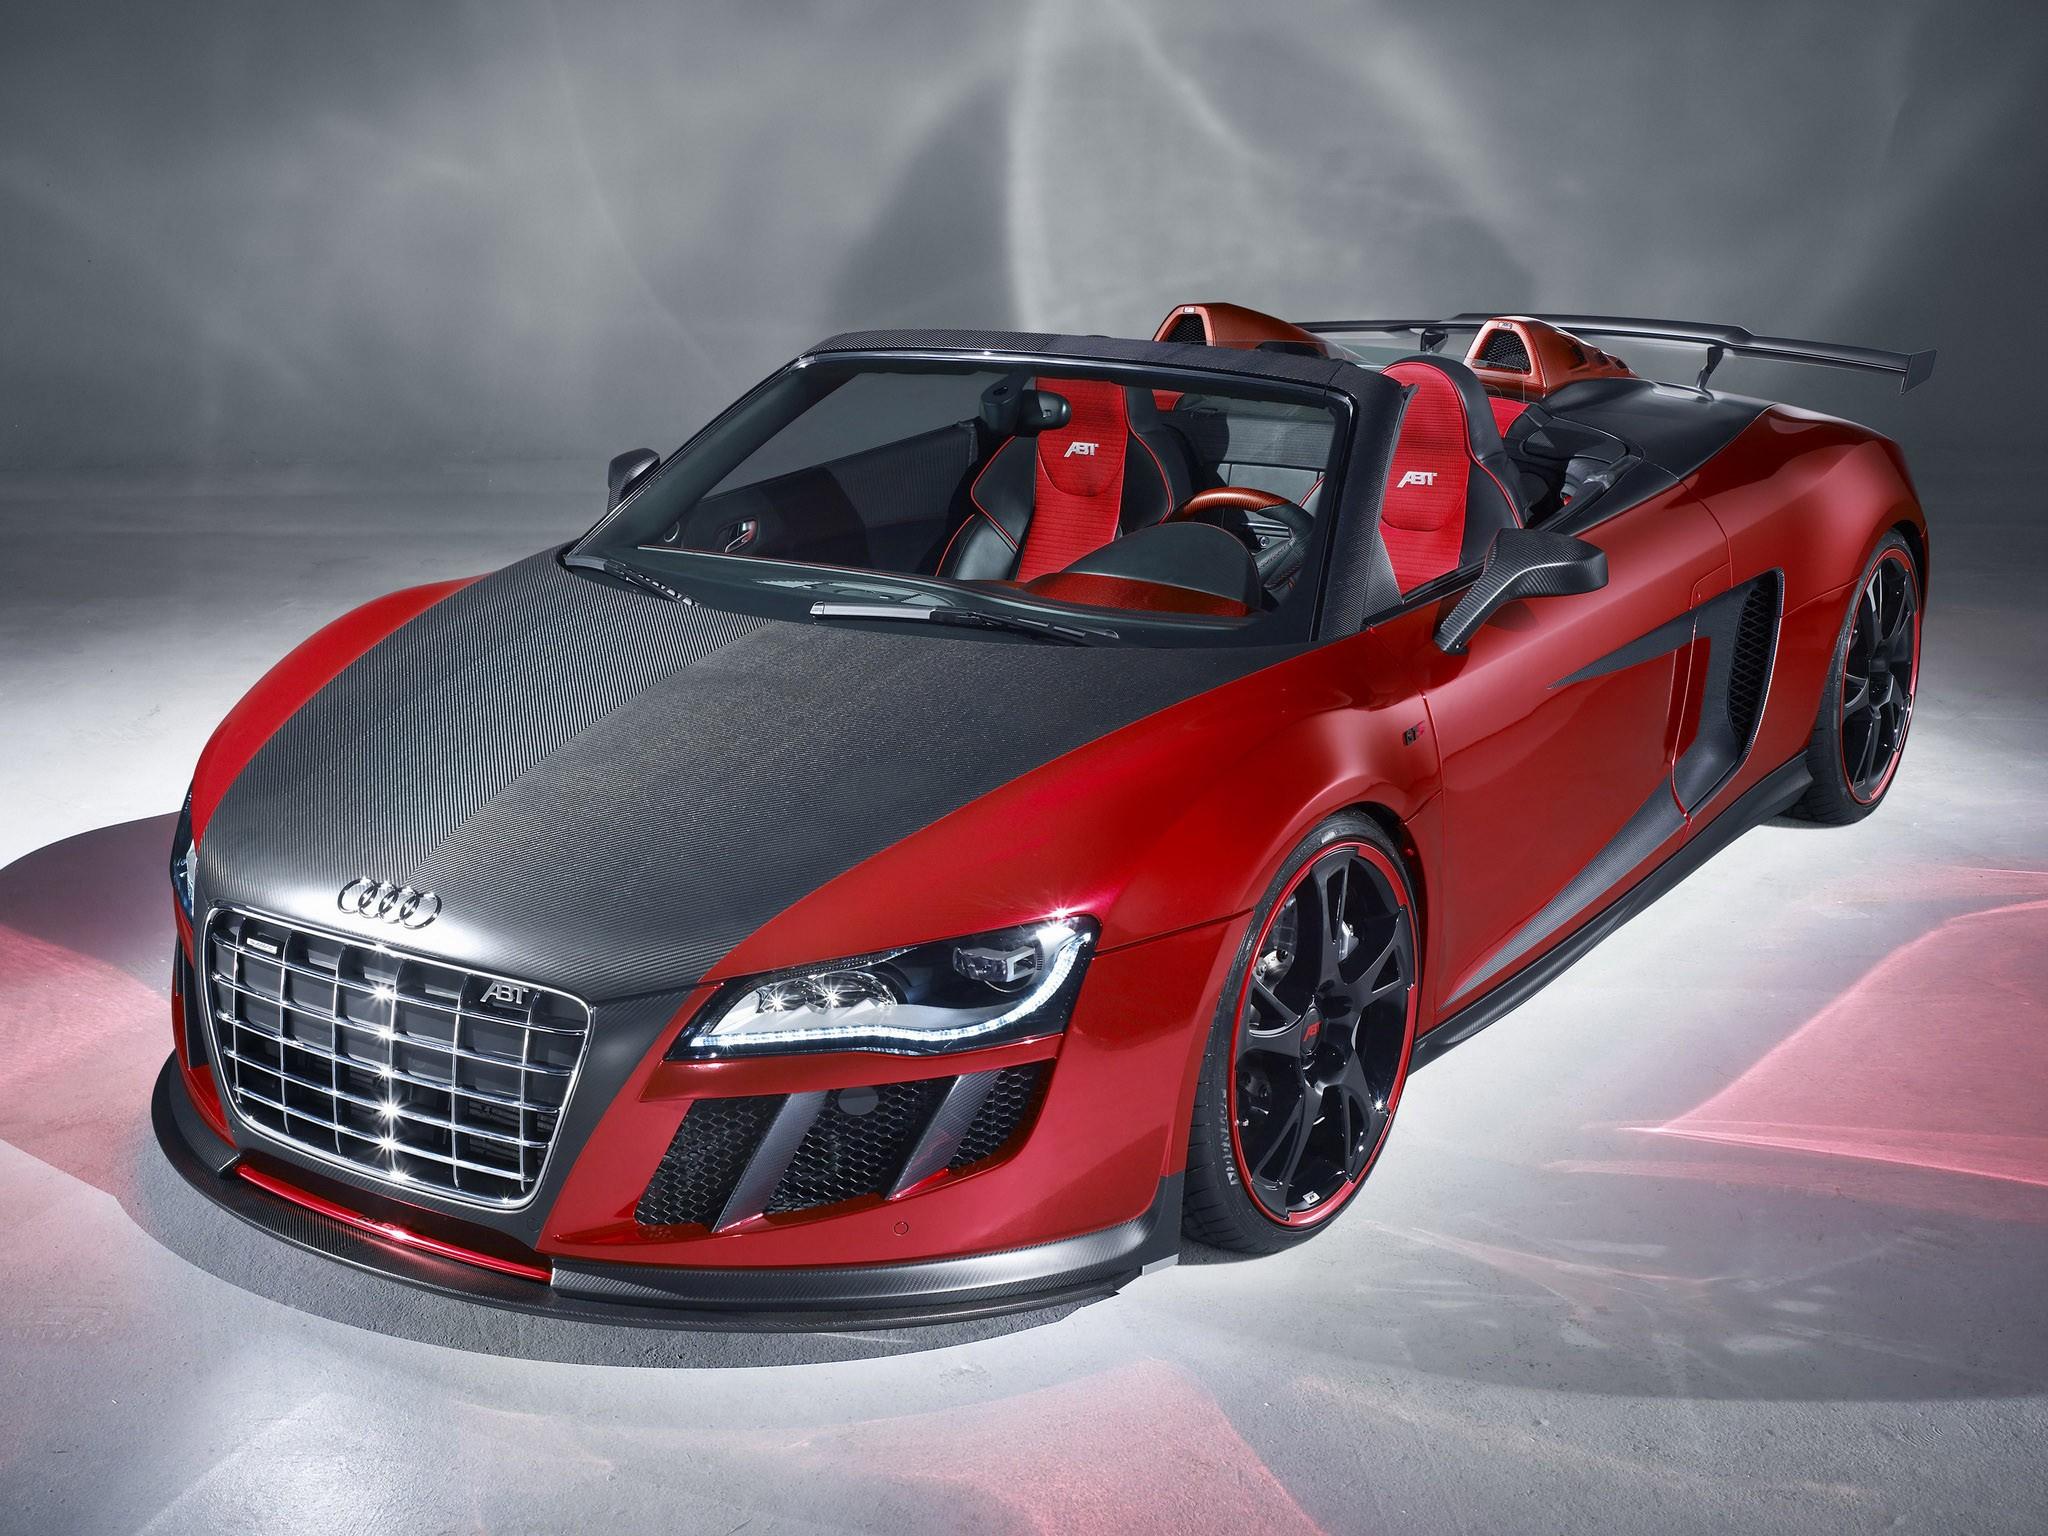 Audi R8 GTS 2011 - ABT